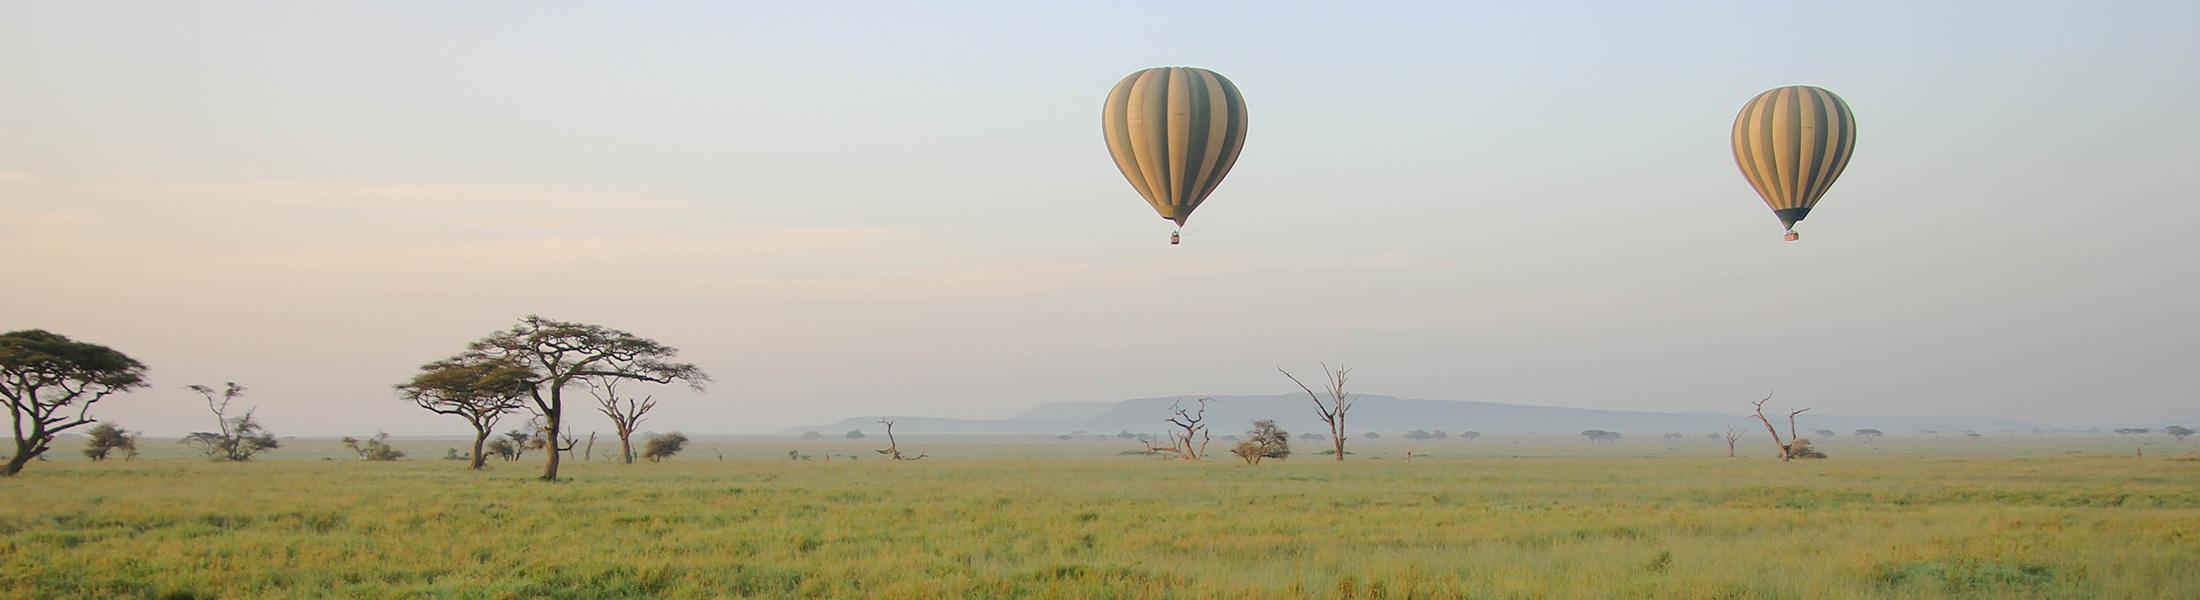 Hot Air Balloons over the African Savannah